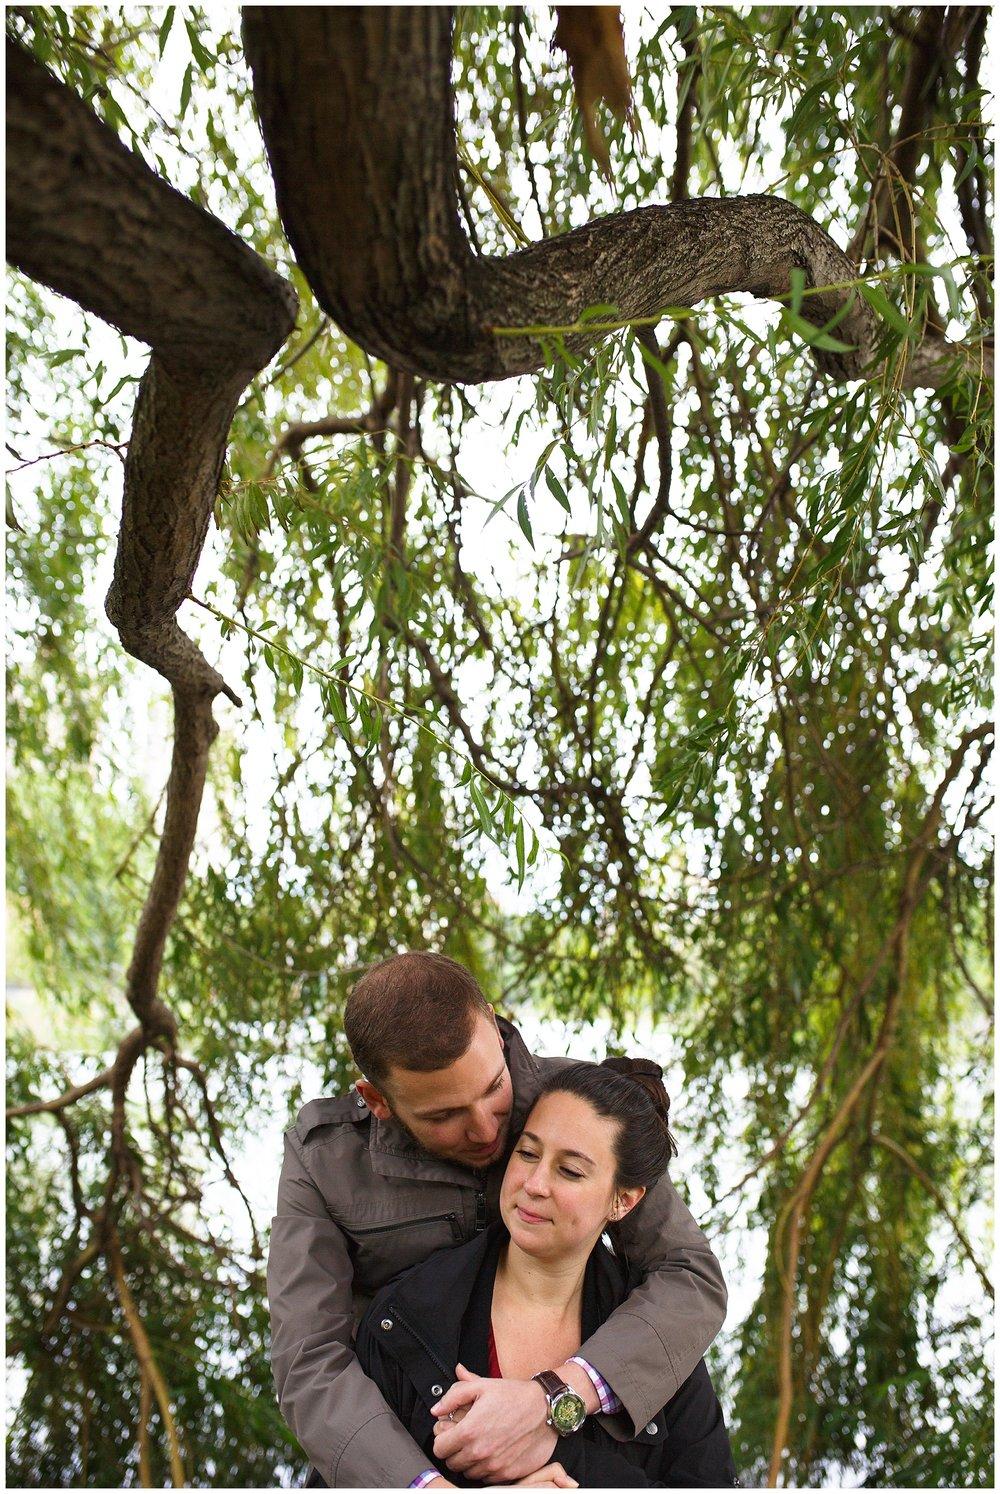 Dan + Carolyn Engagement - Chelsea Matson Photography 2016